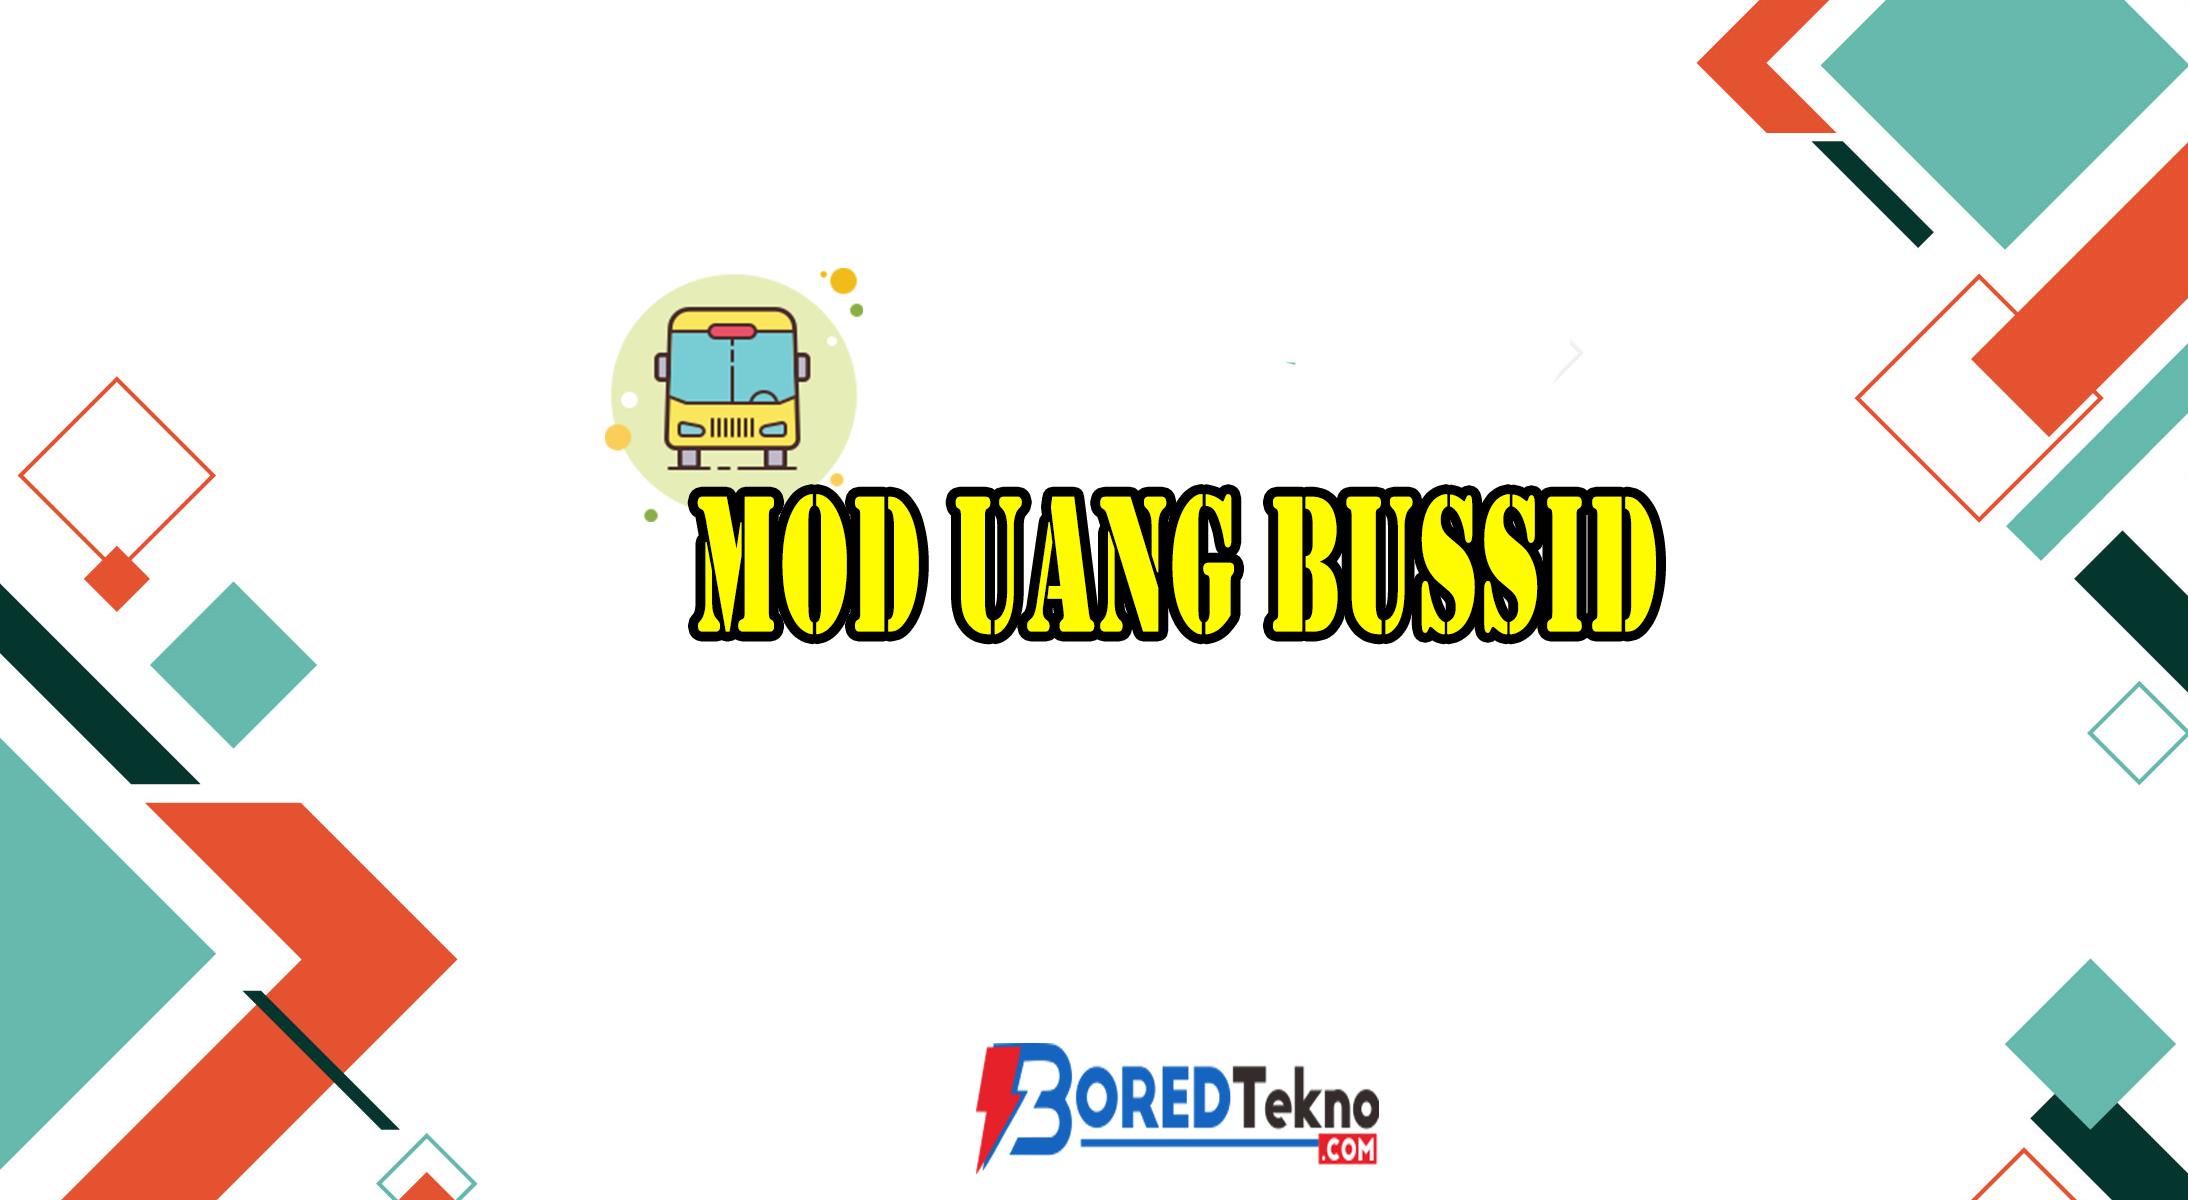 MOD Uang Bussid